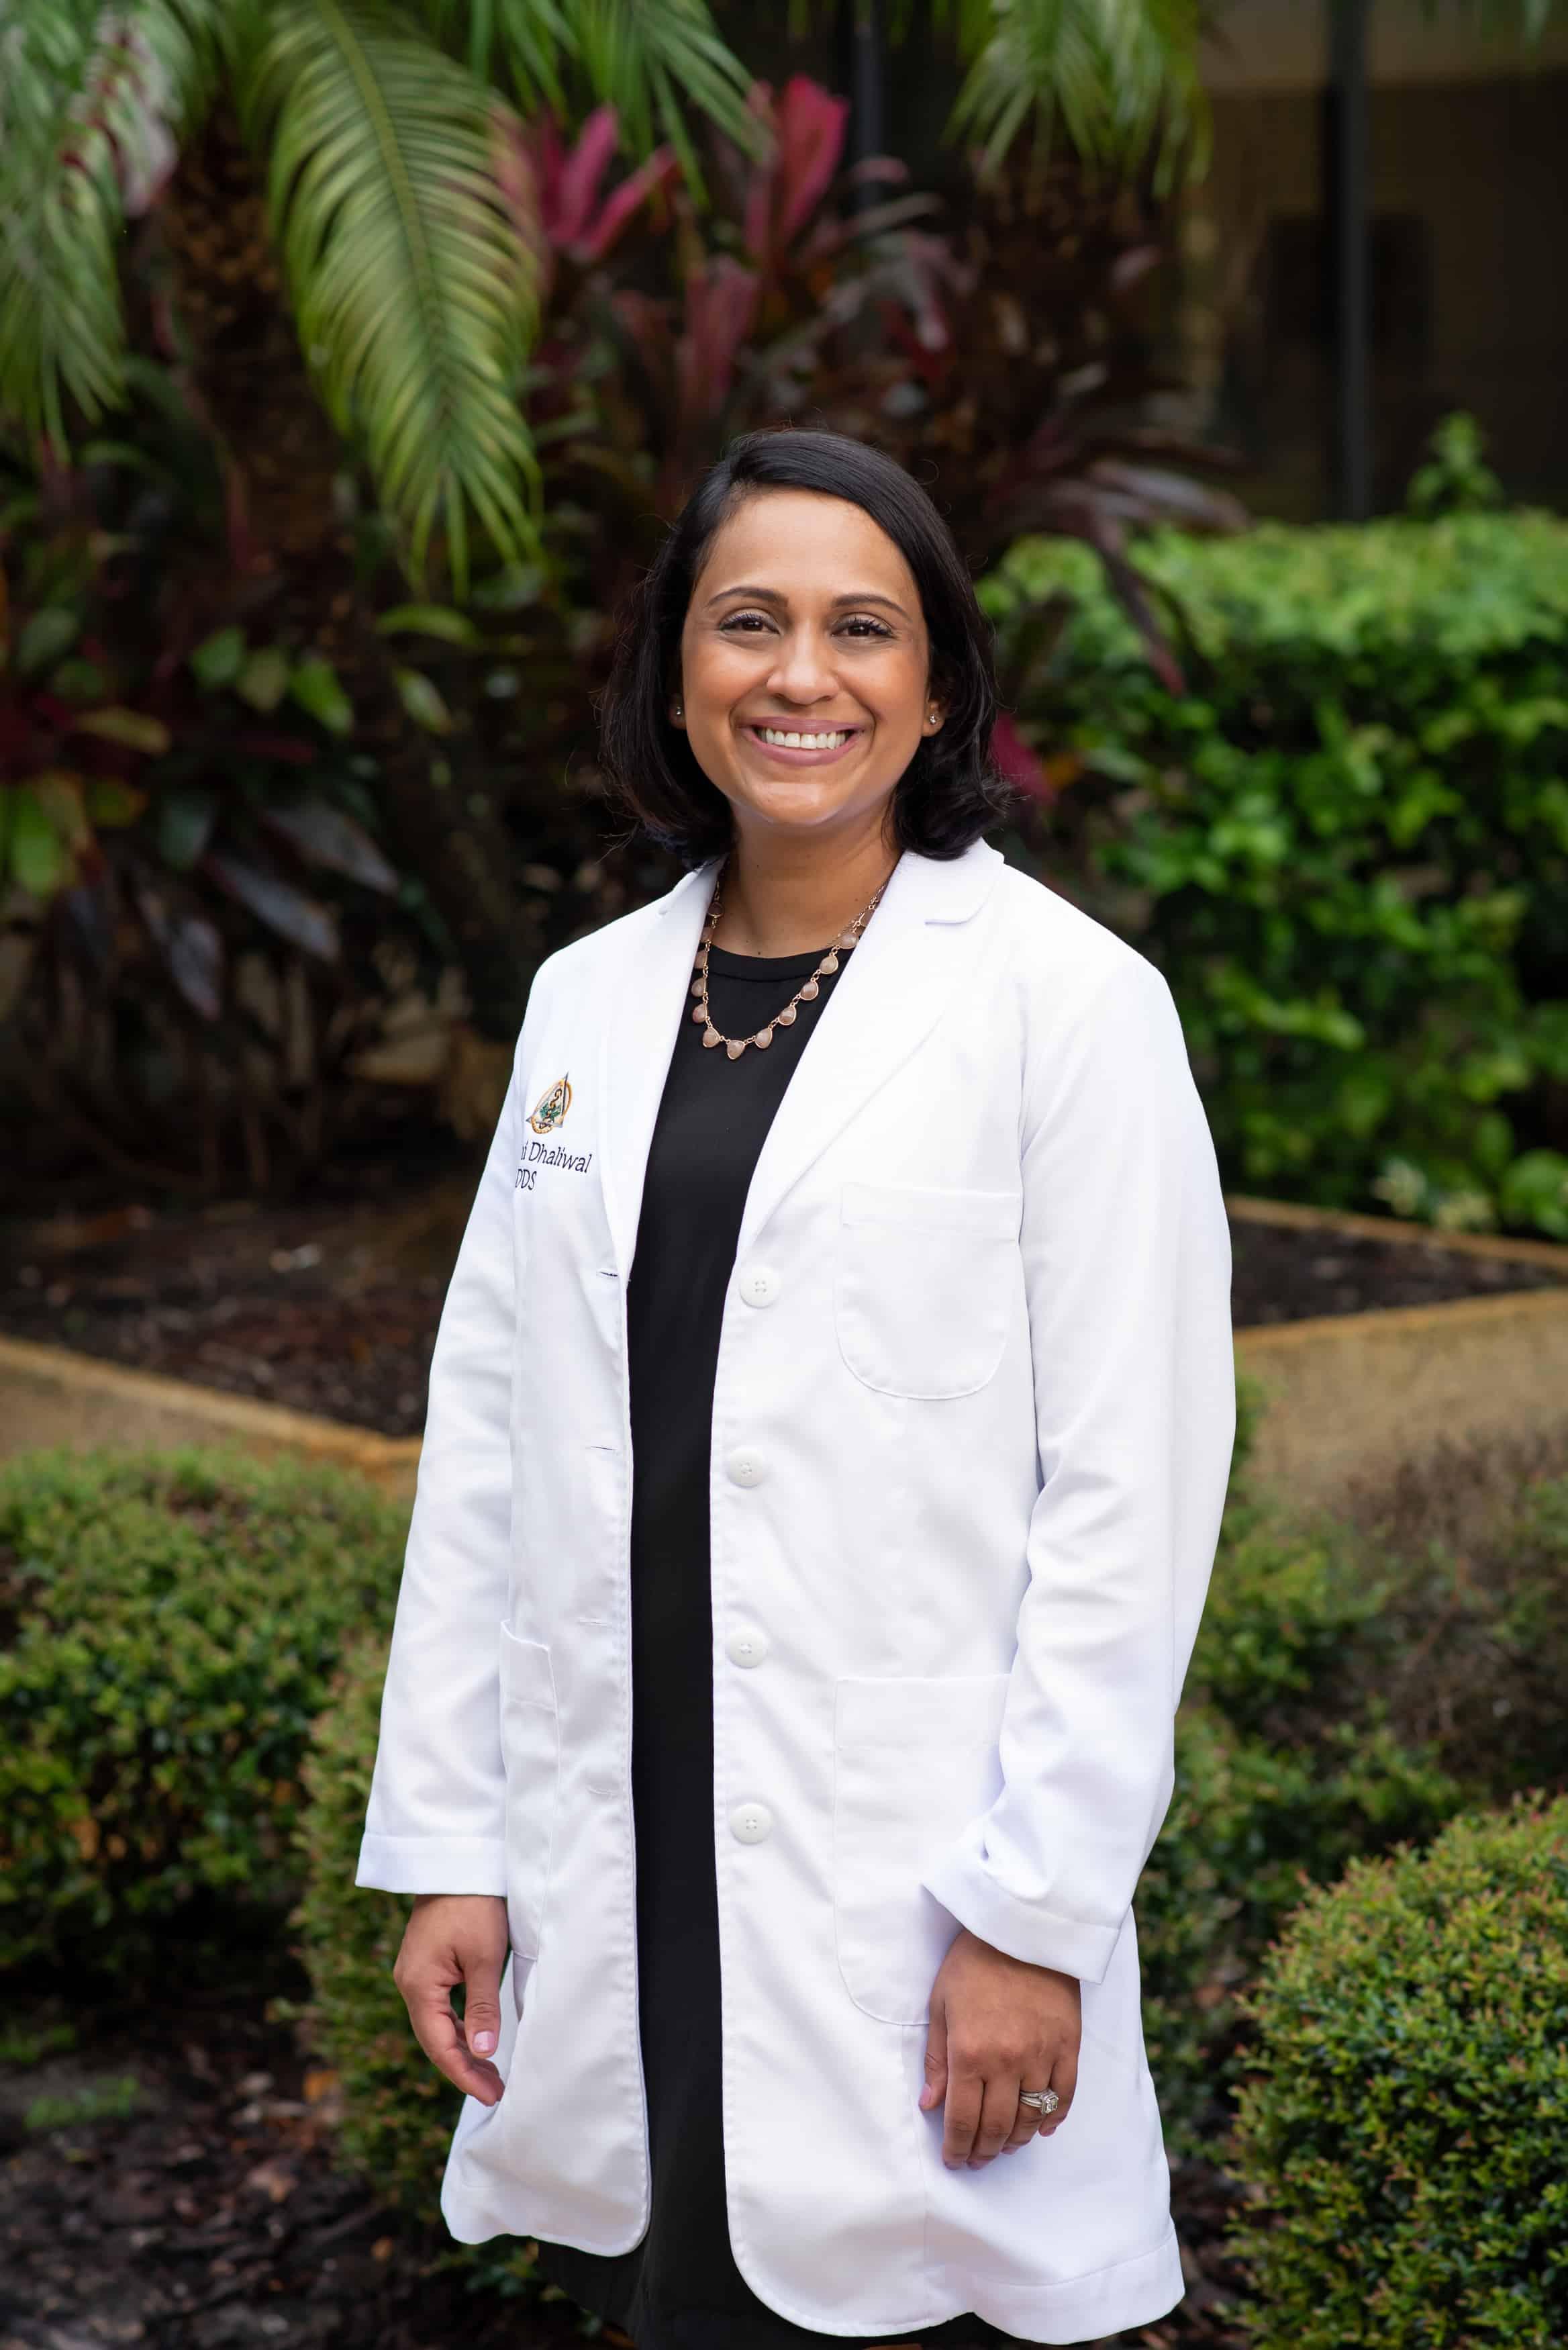 Dr. Avni Dhaliwal - Dentist in Maitland, Fl